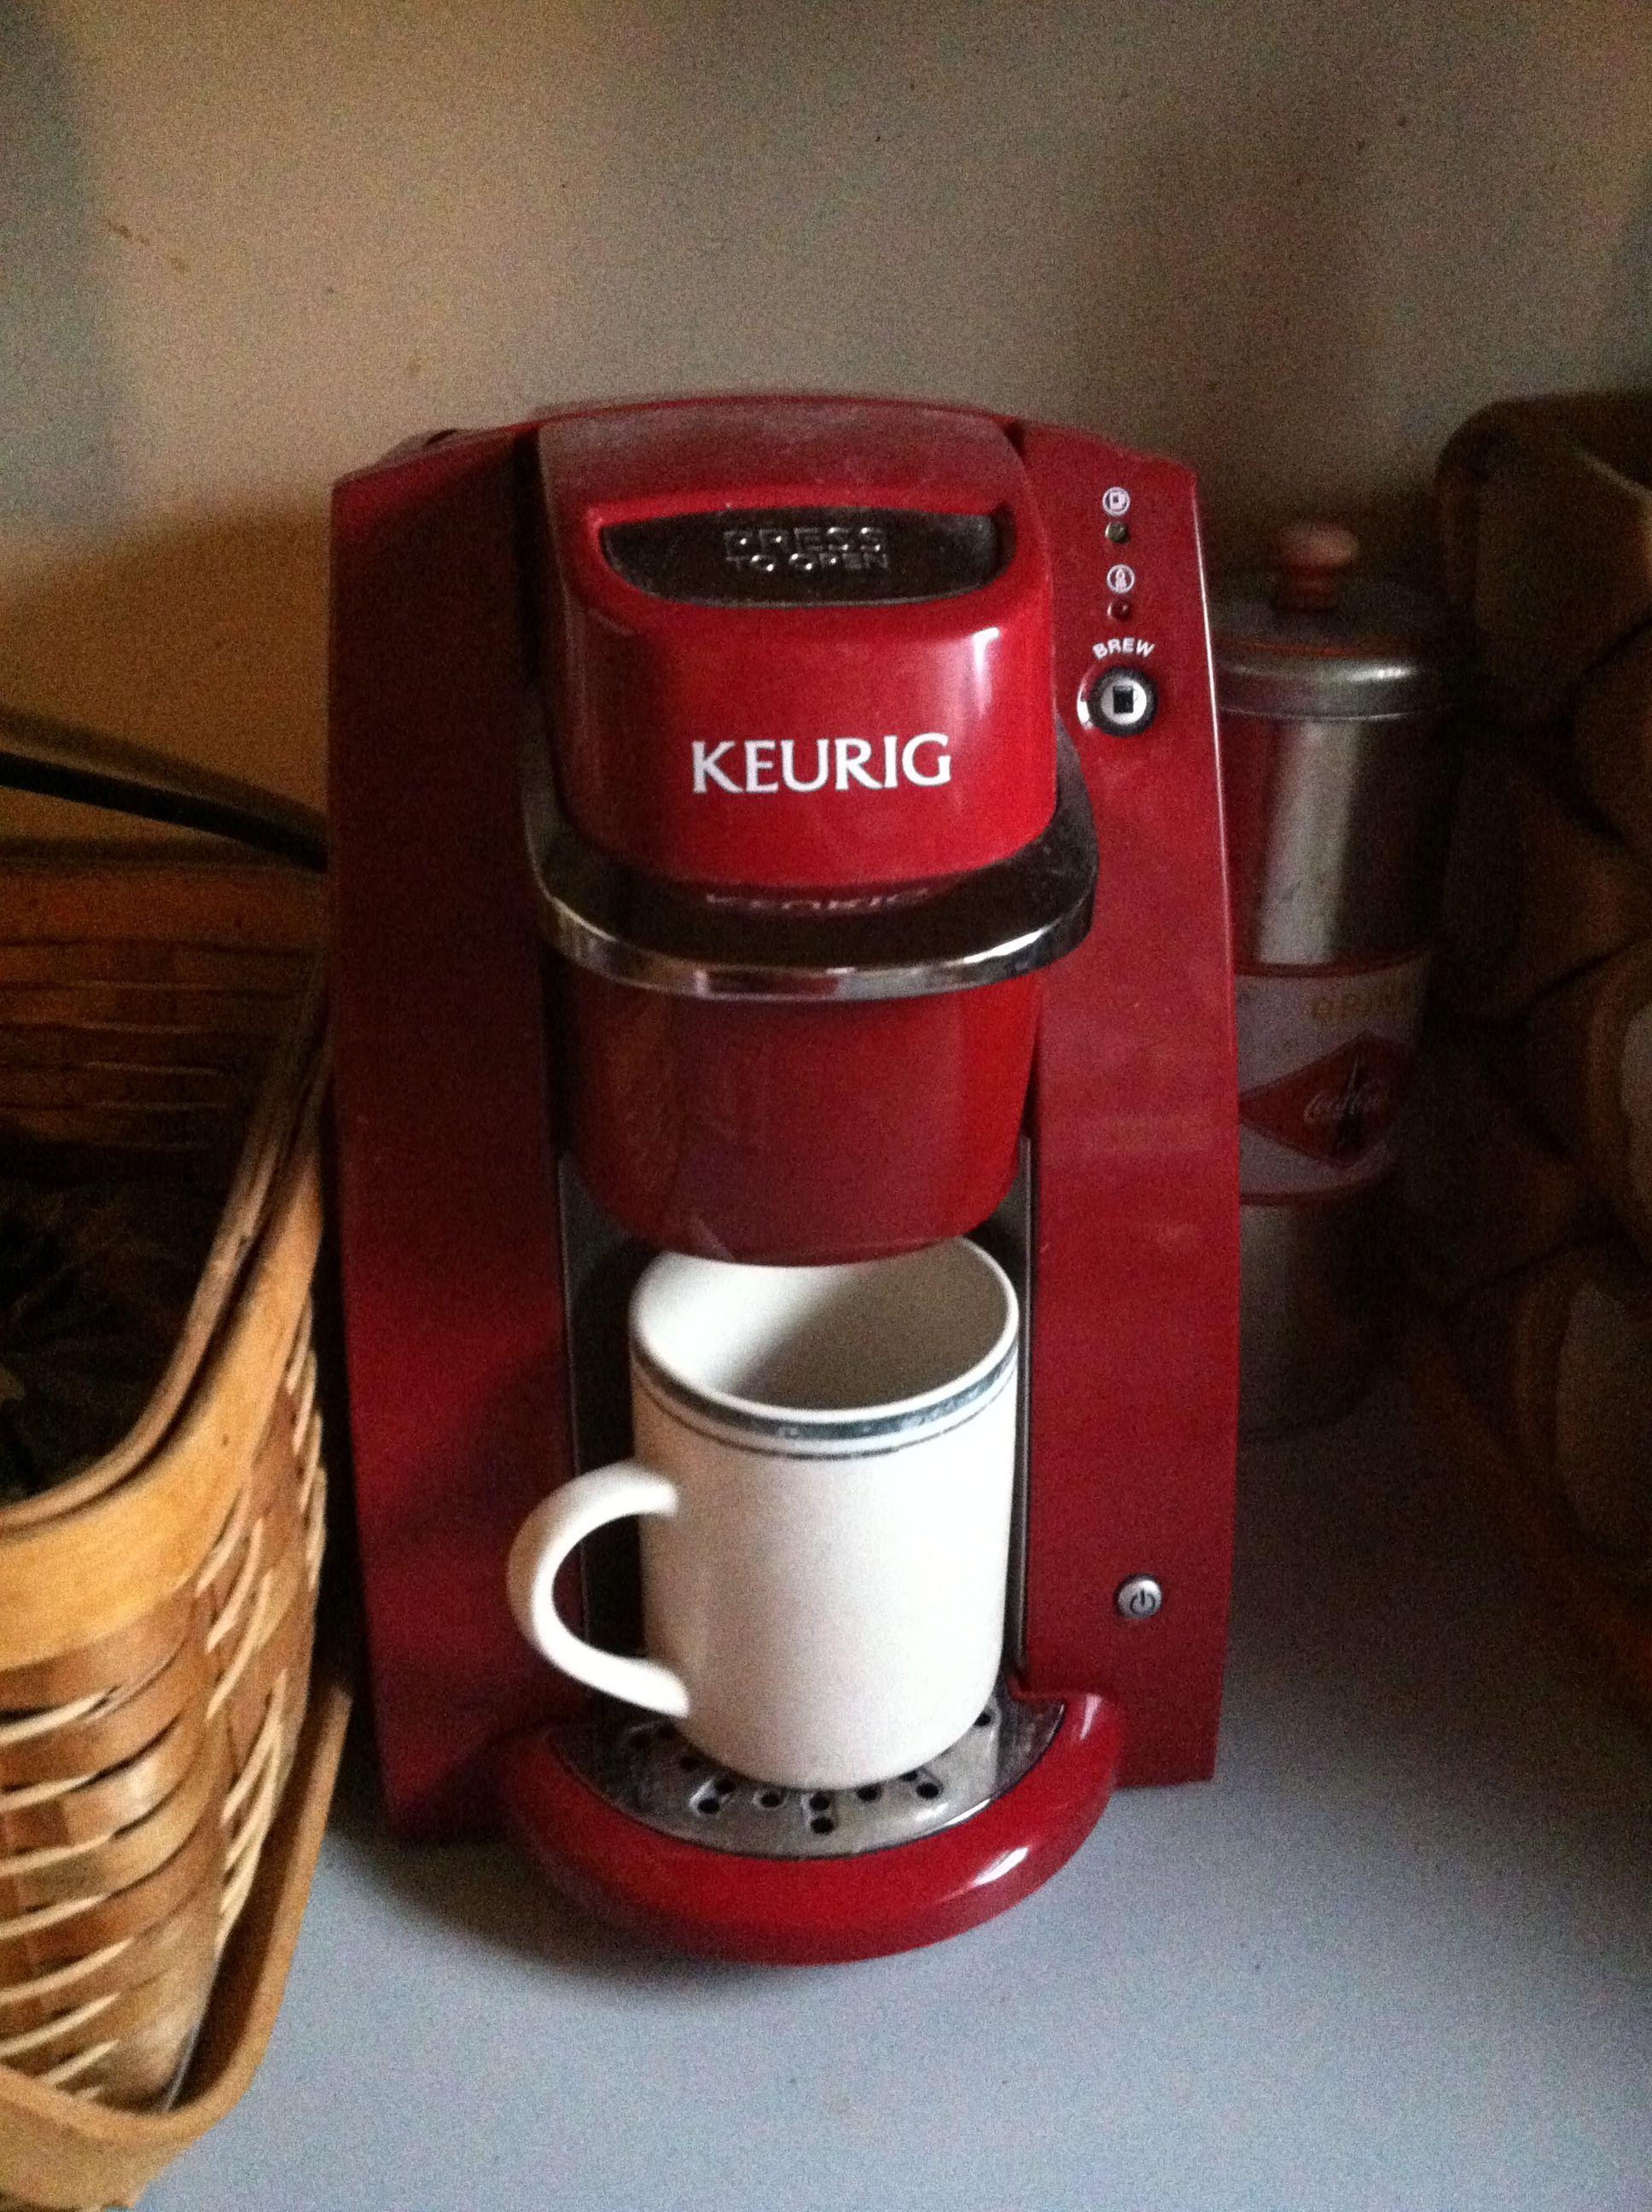 Keurig coffee maker l keurig coffee makers keurig